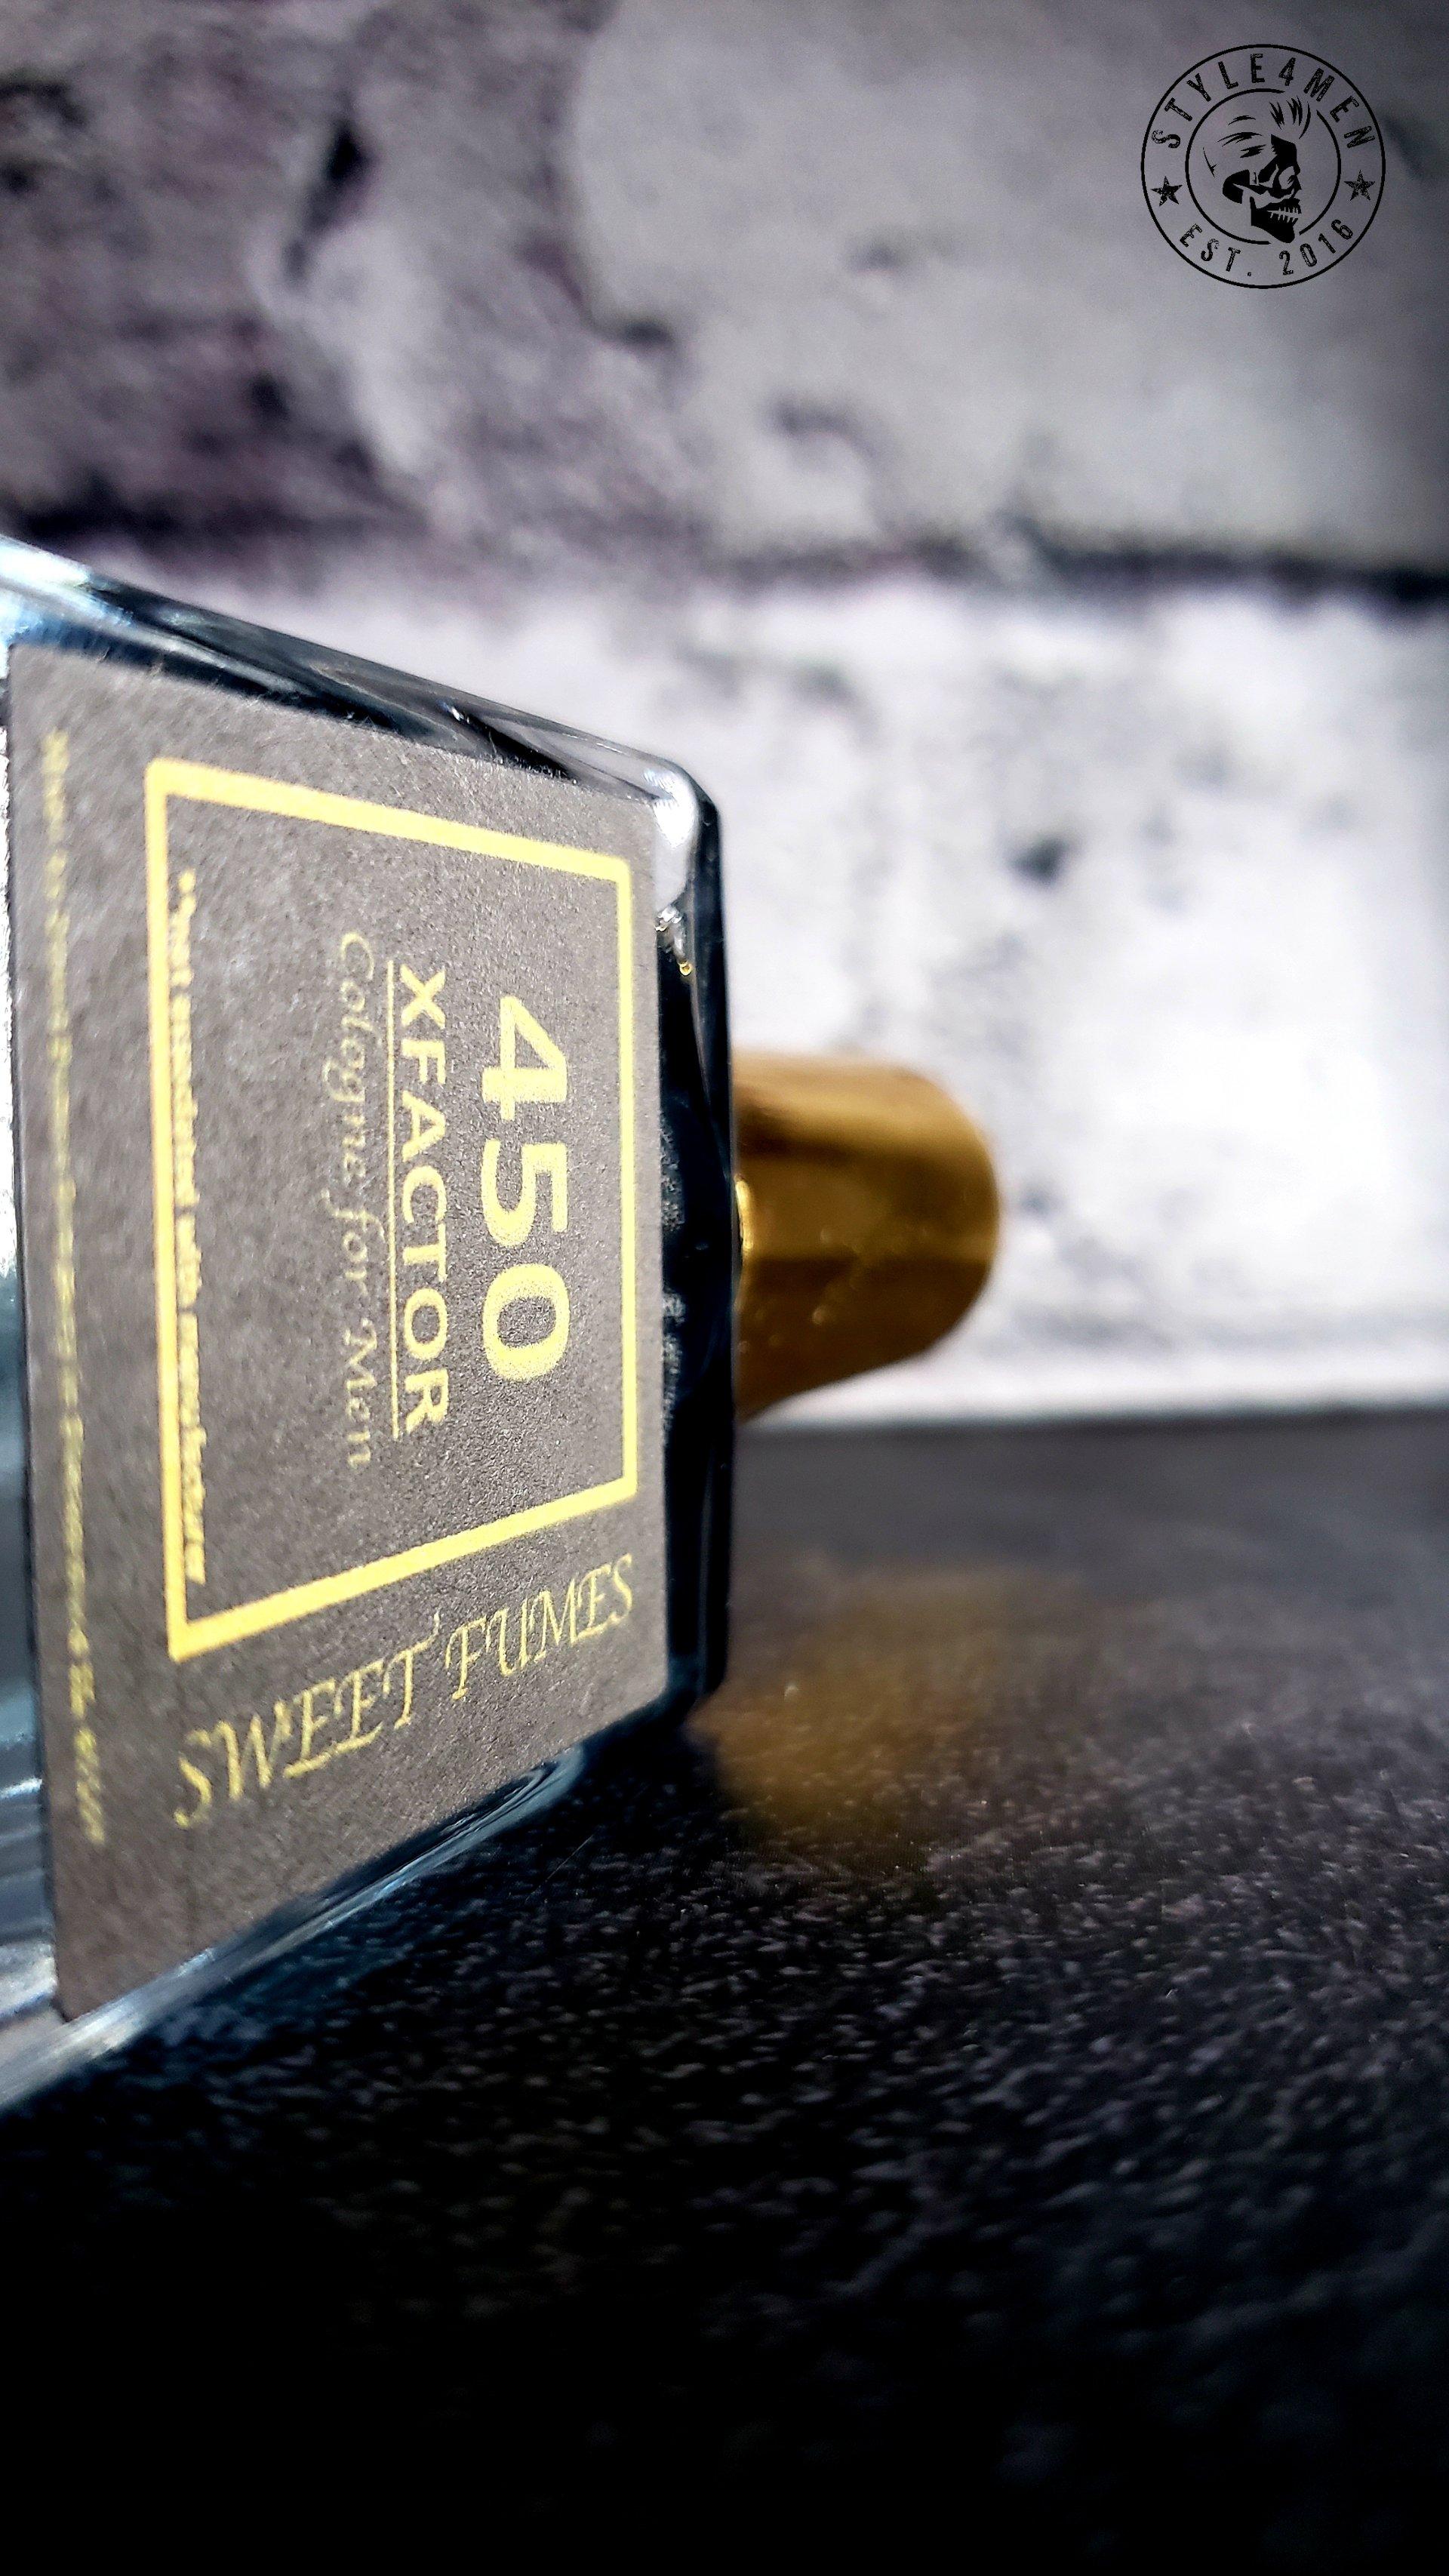 Sweet Fumes 450 XFACTOR